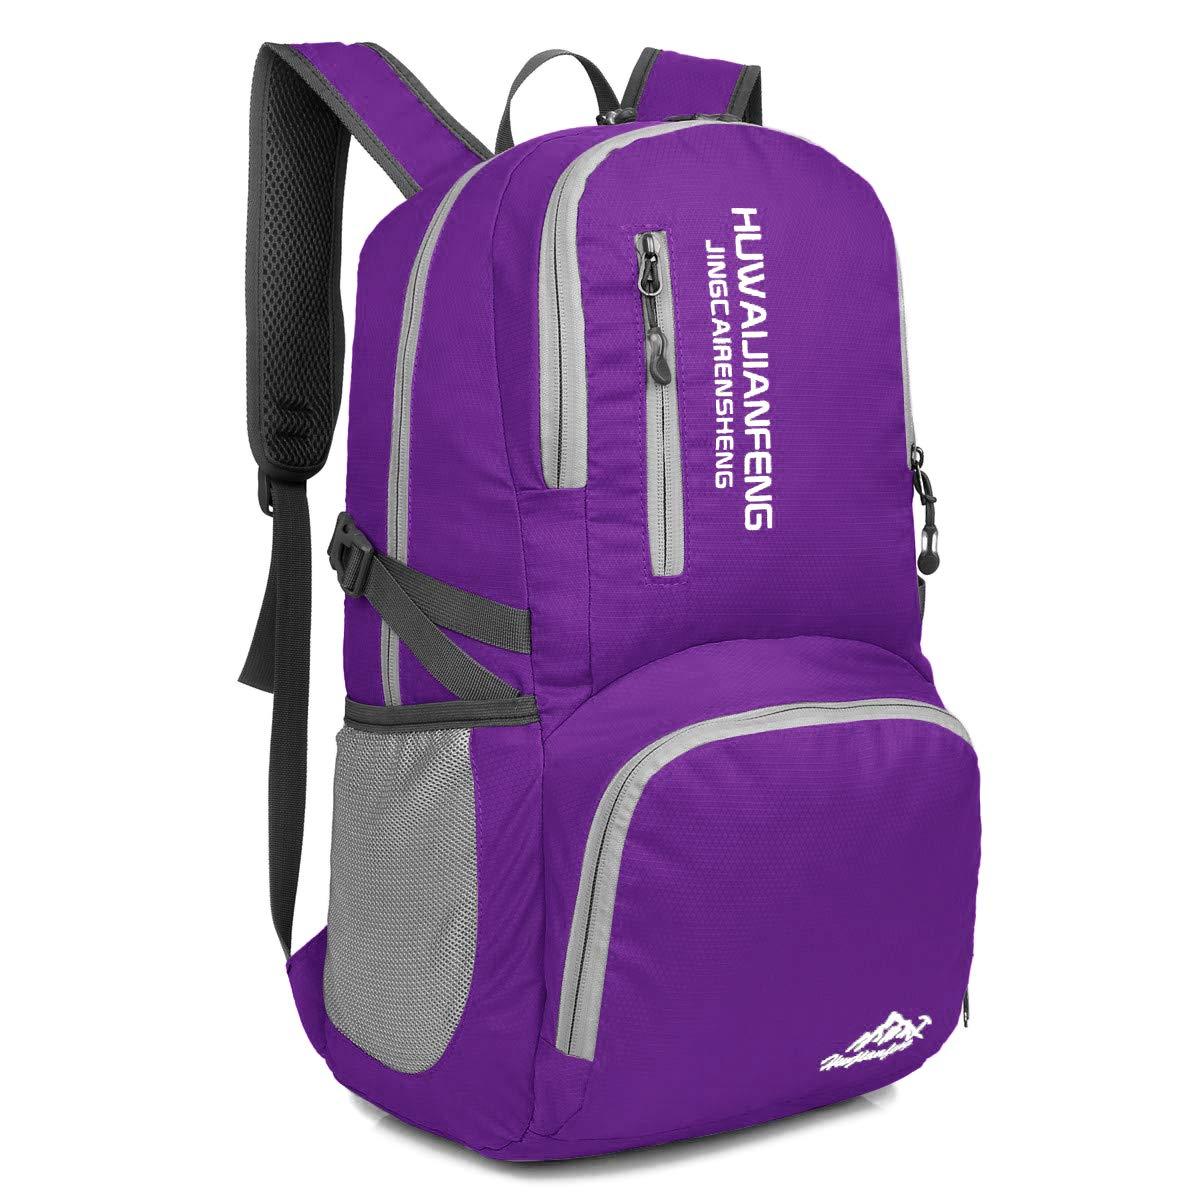 Meetrip 35L Lightweight Backpack Hiking Travel Packable Daypack for Women Men